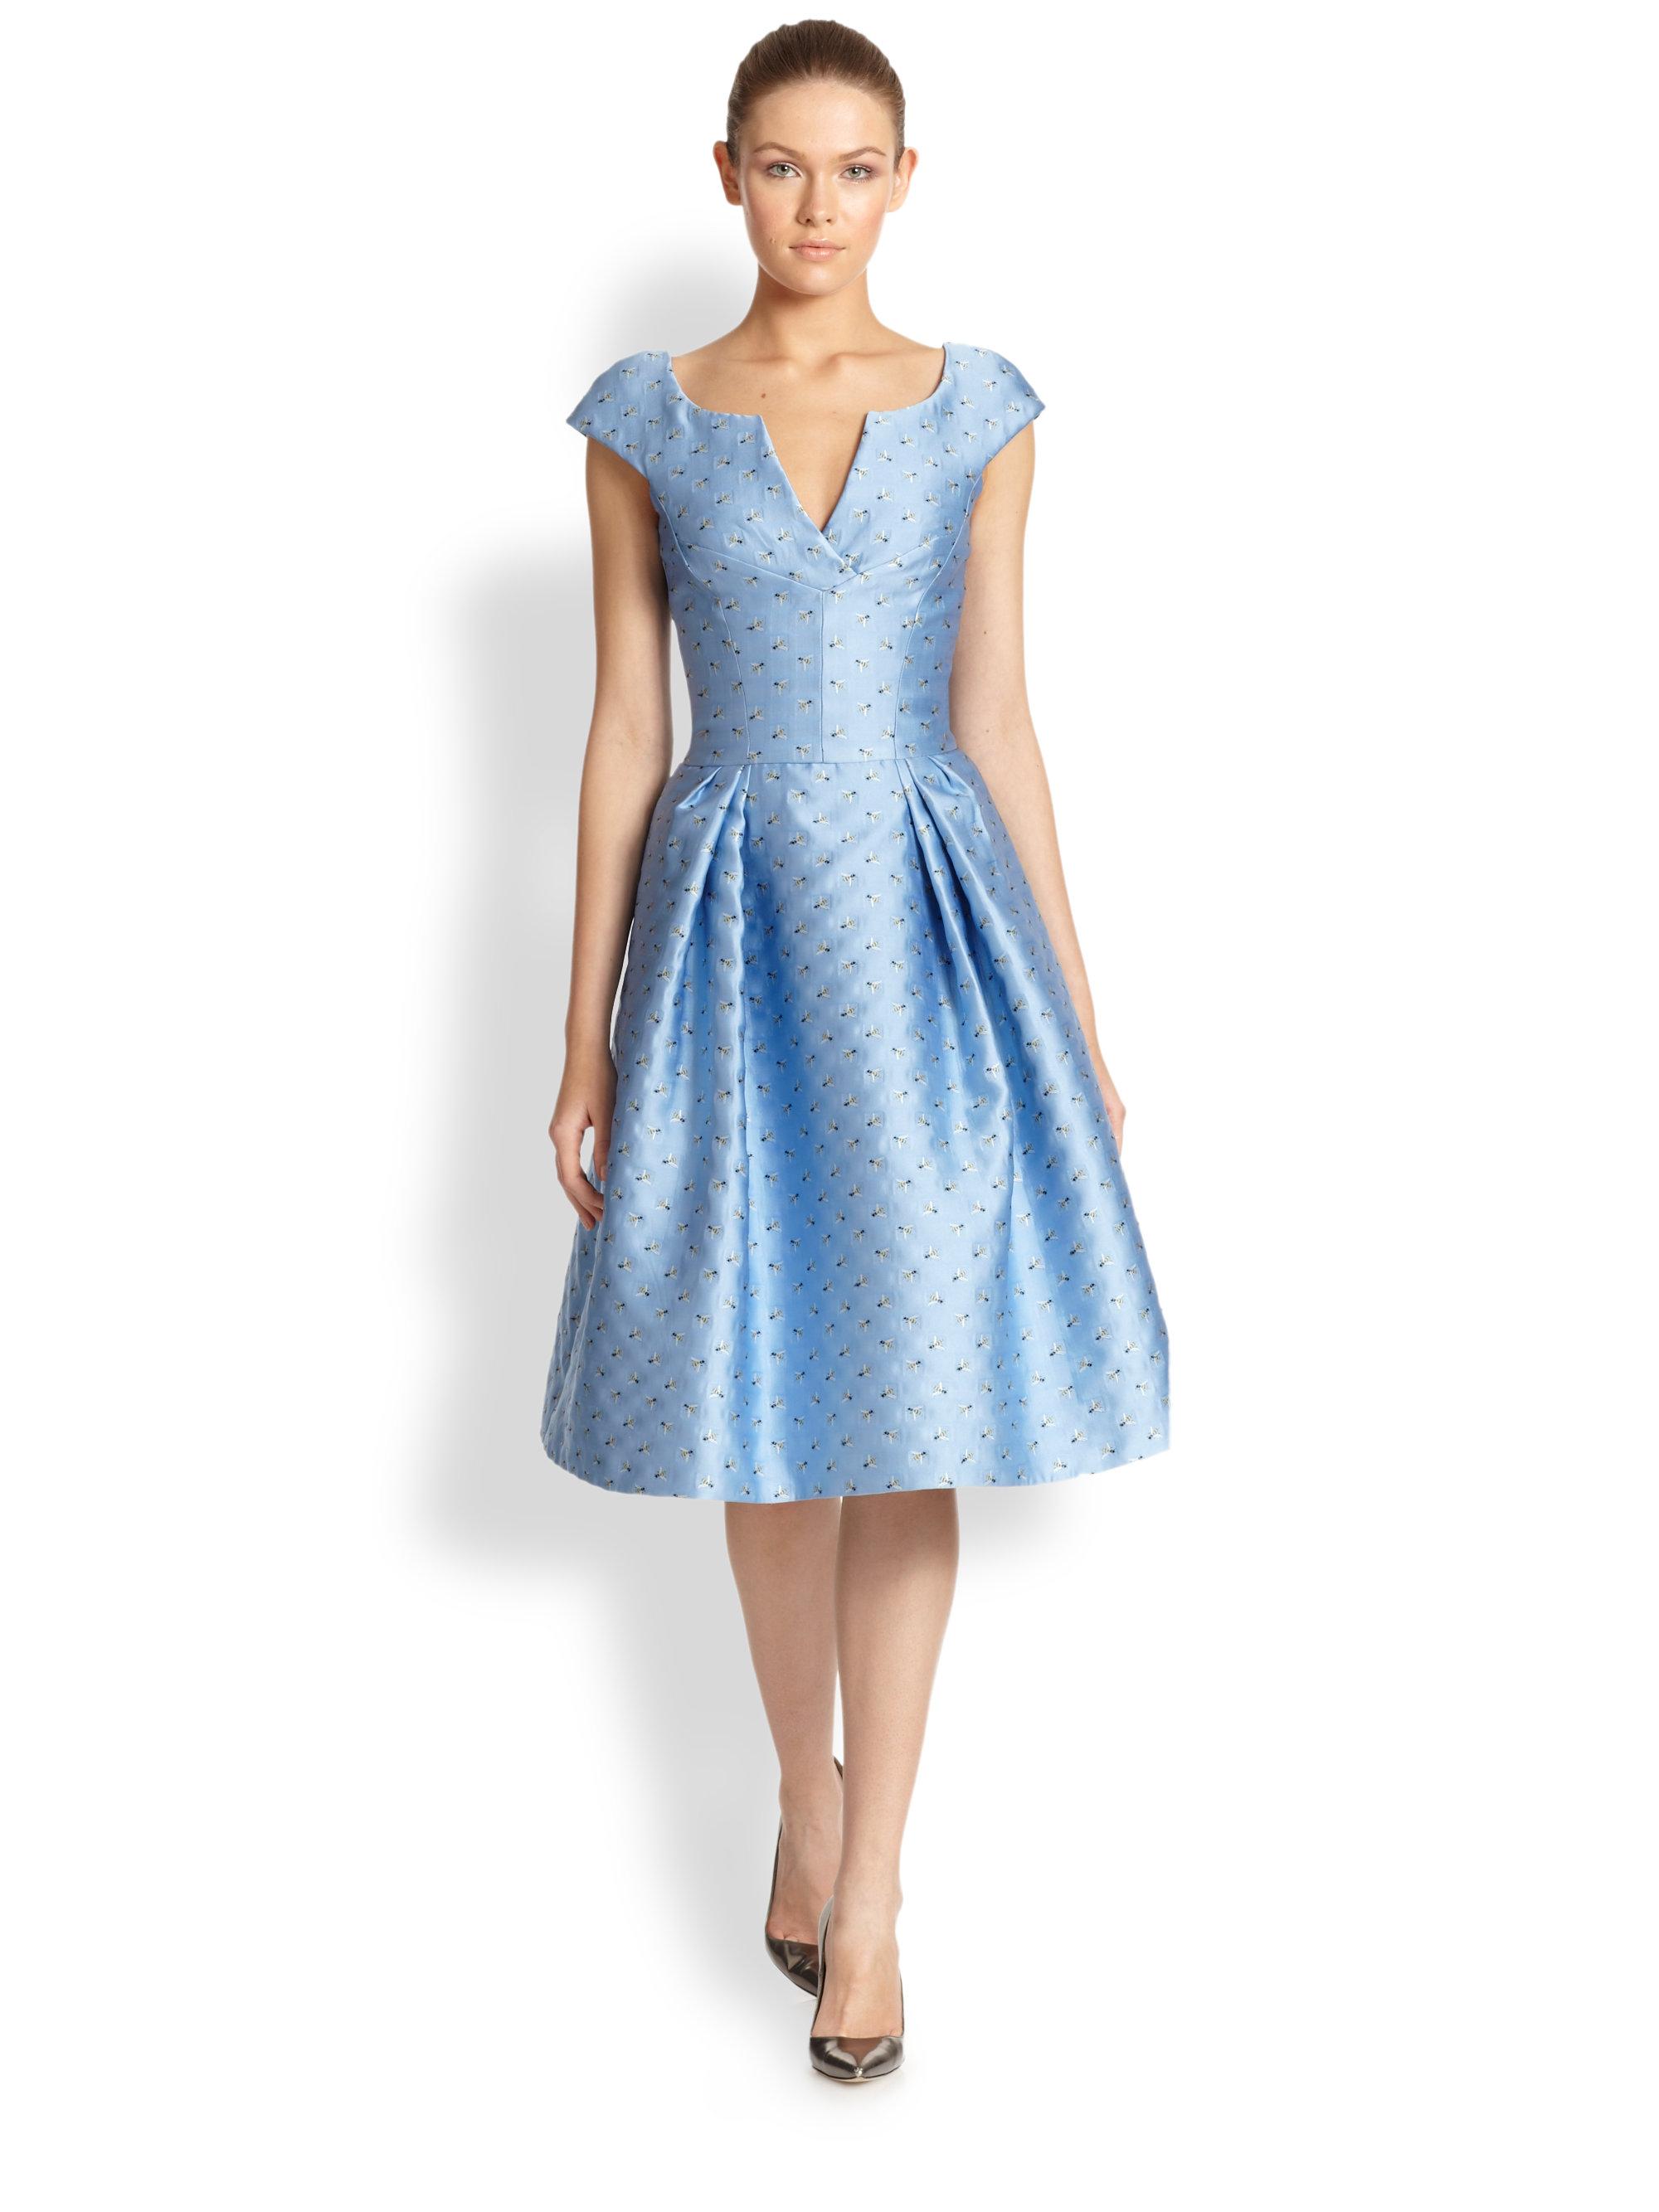 a0c3b6548ac Carolina Herrera Bee Jacquard Cocktail Dress in Blue - Lyst